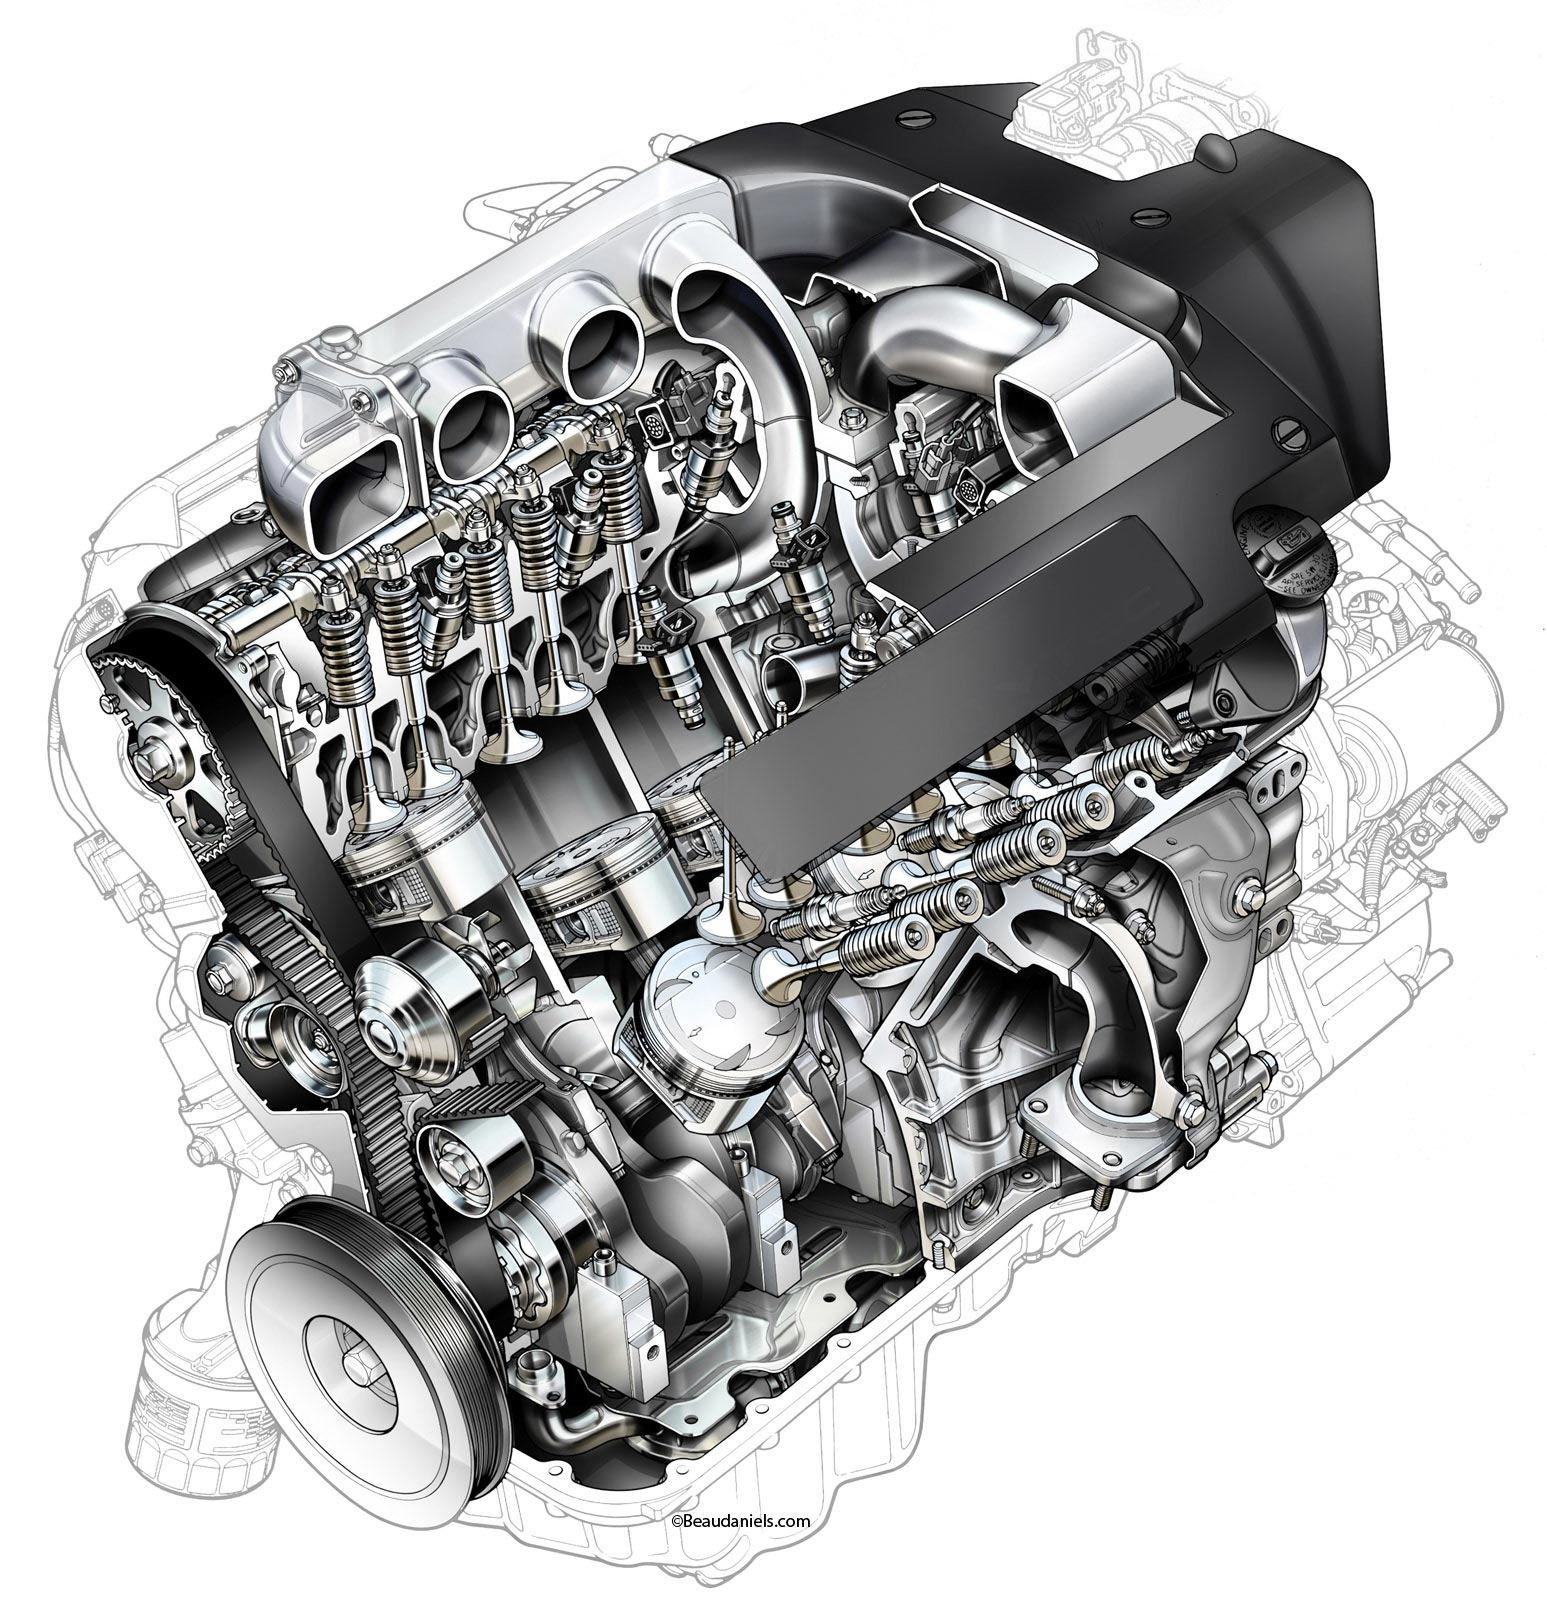 Honda Accord V6 engine cutaway